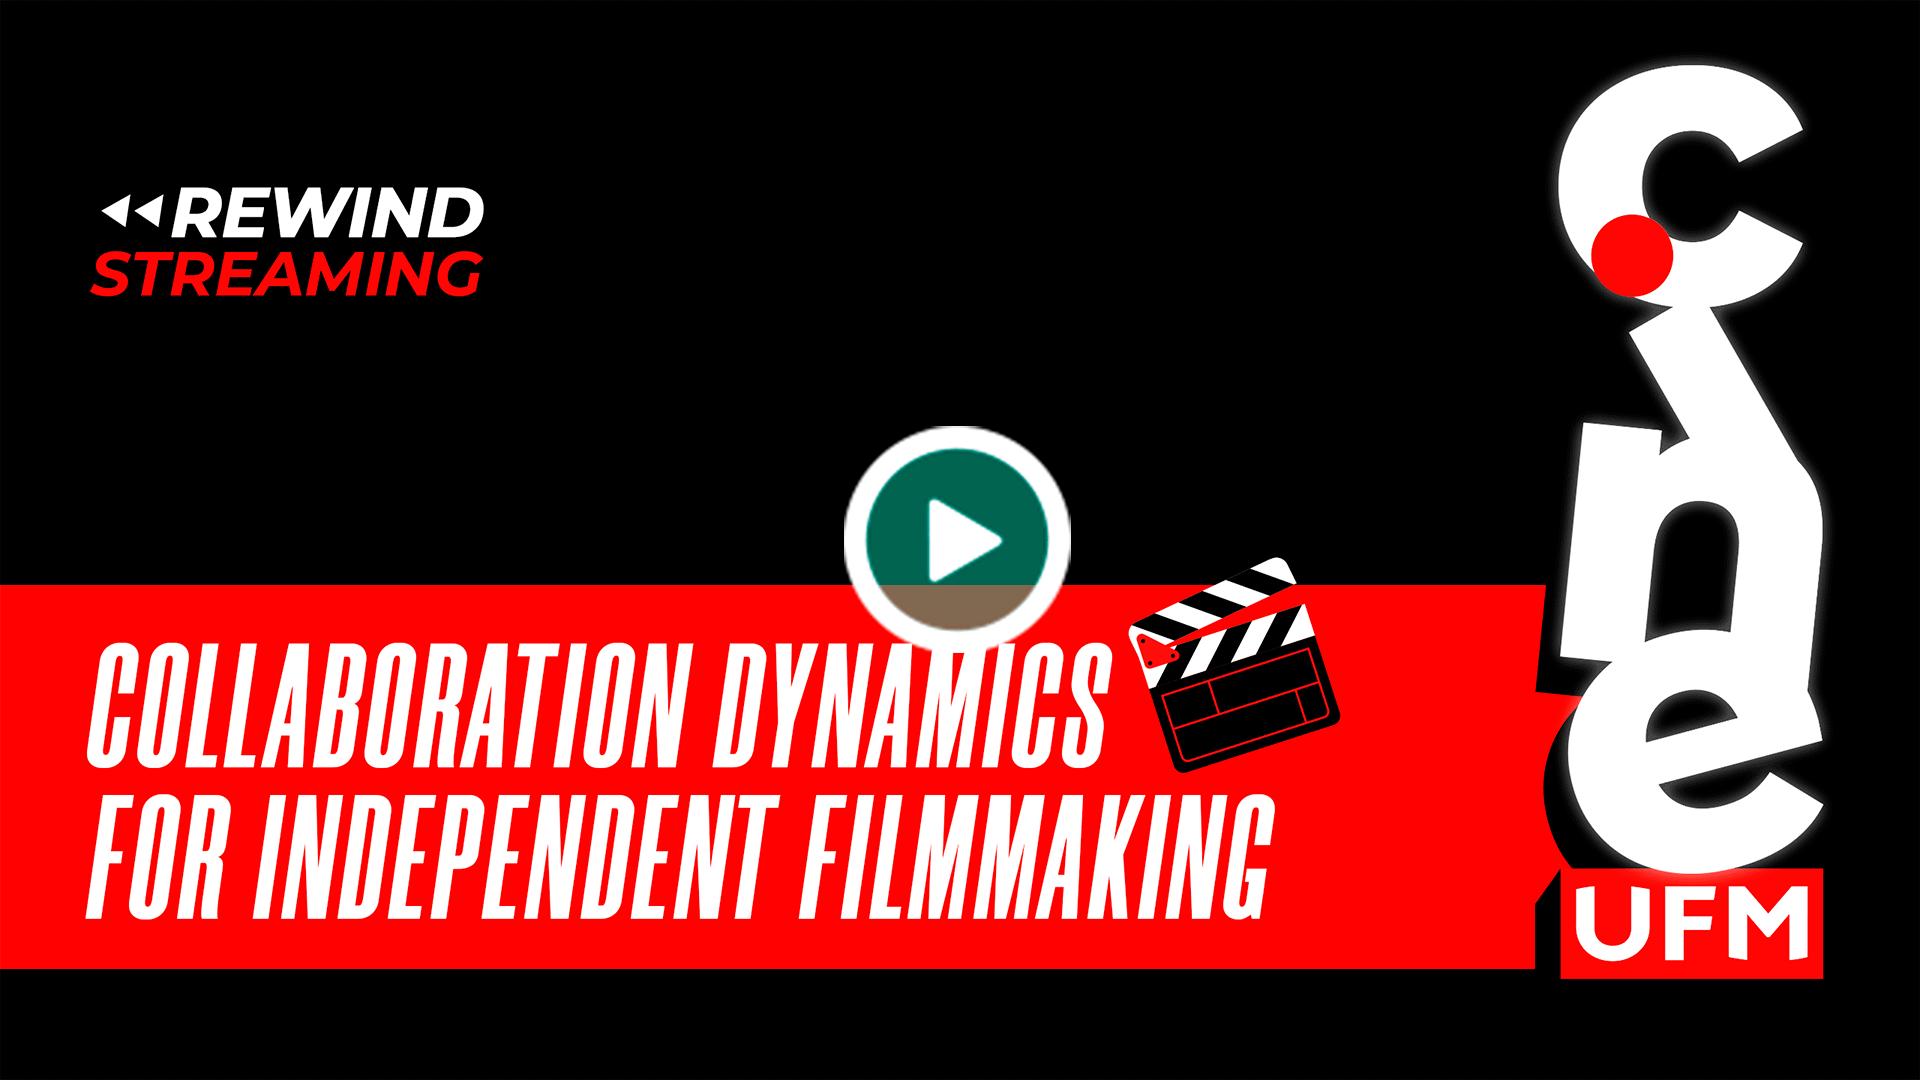 20200508_cineufmlive1_Dynamics_Independent_Filmmaking